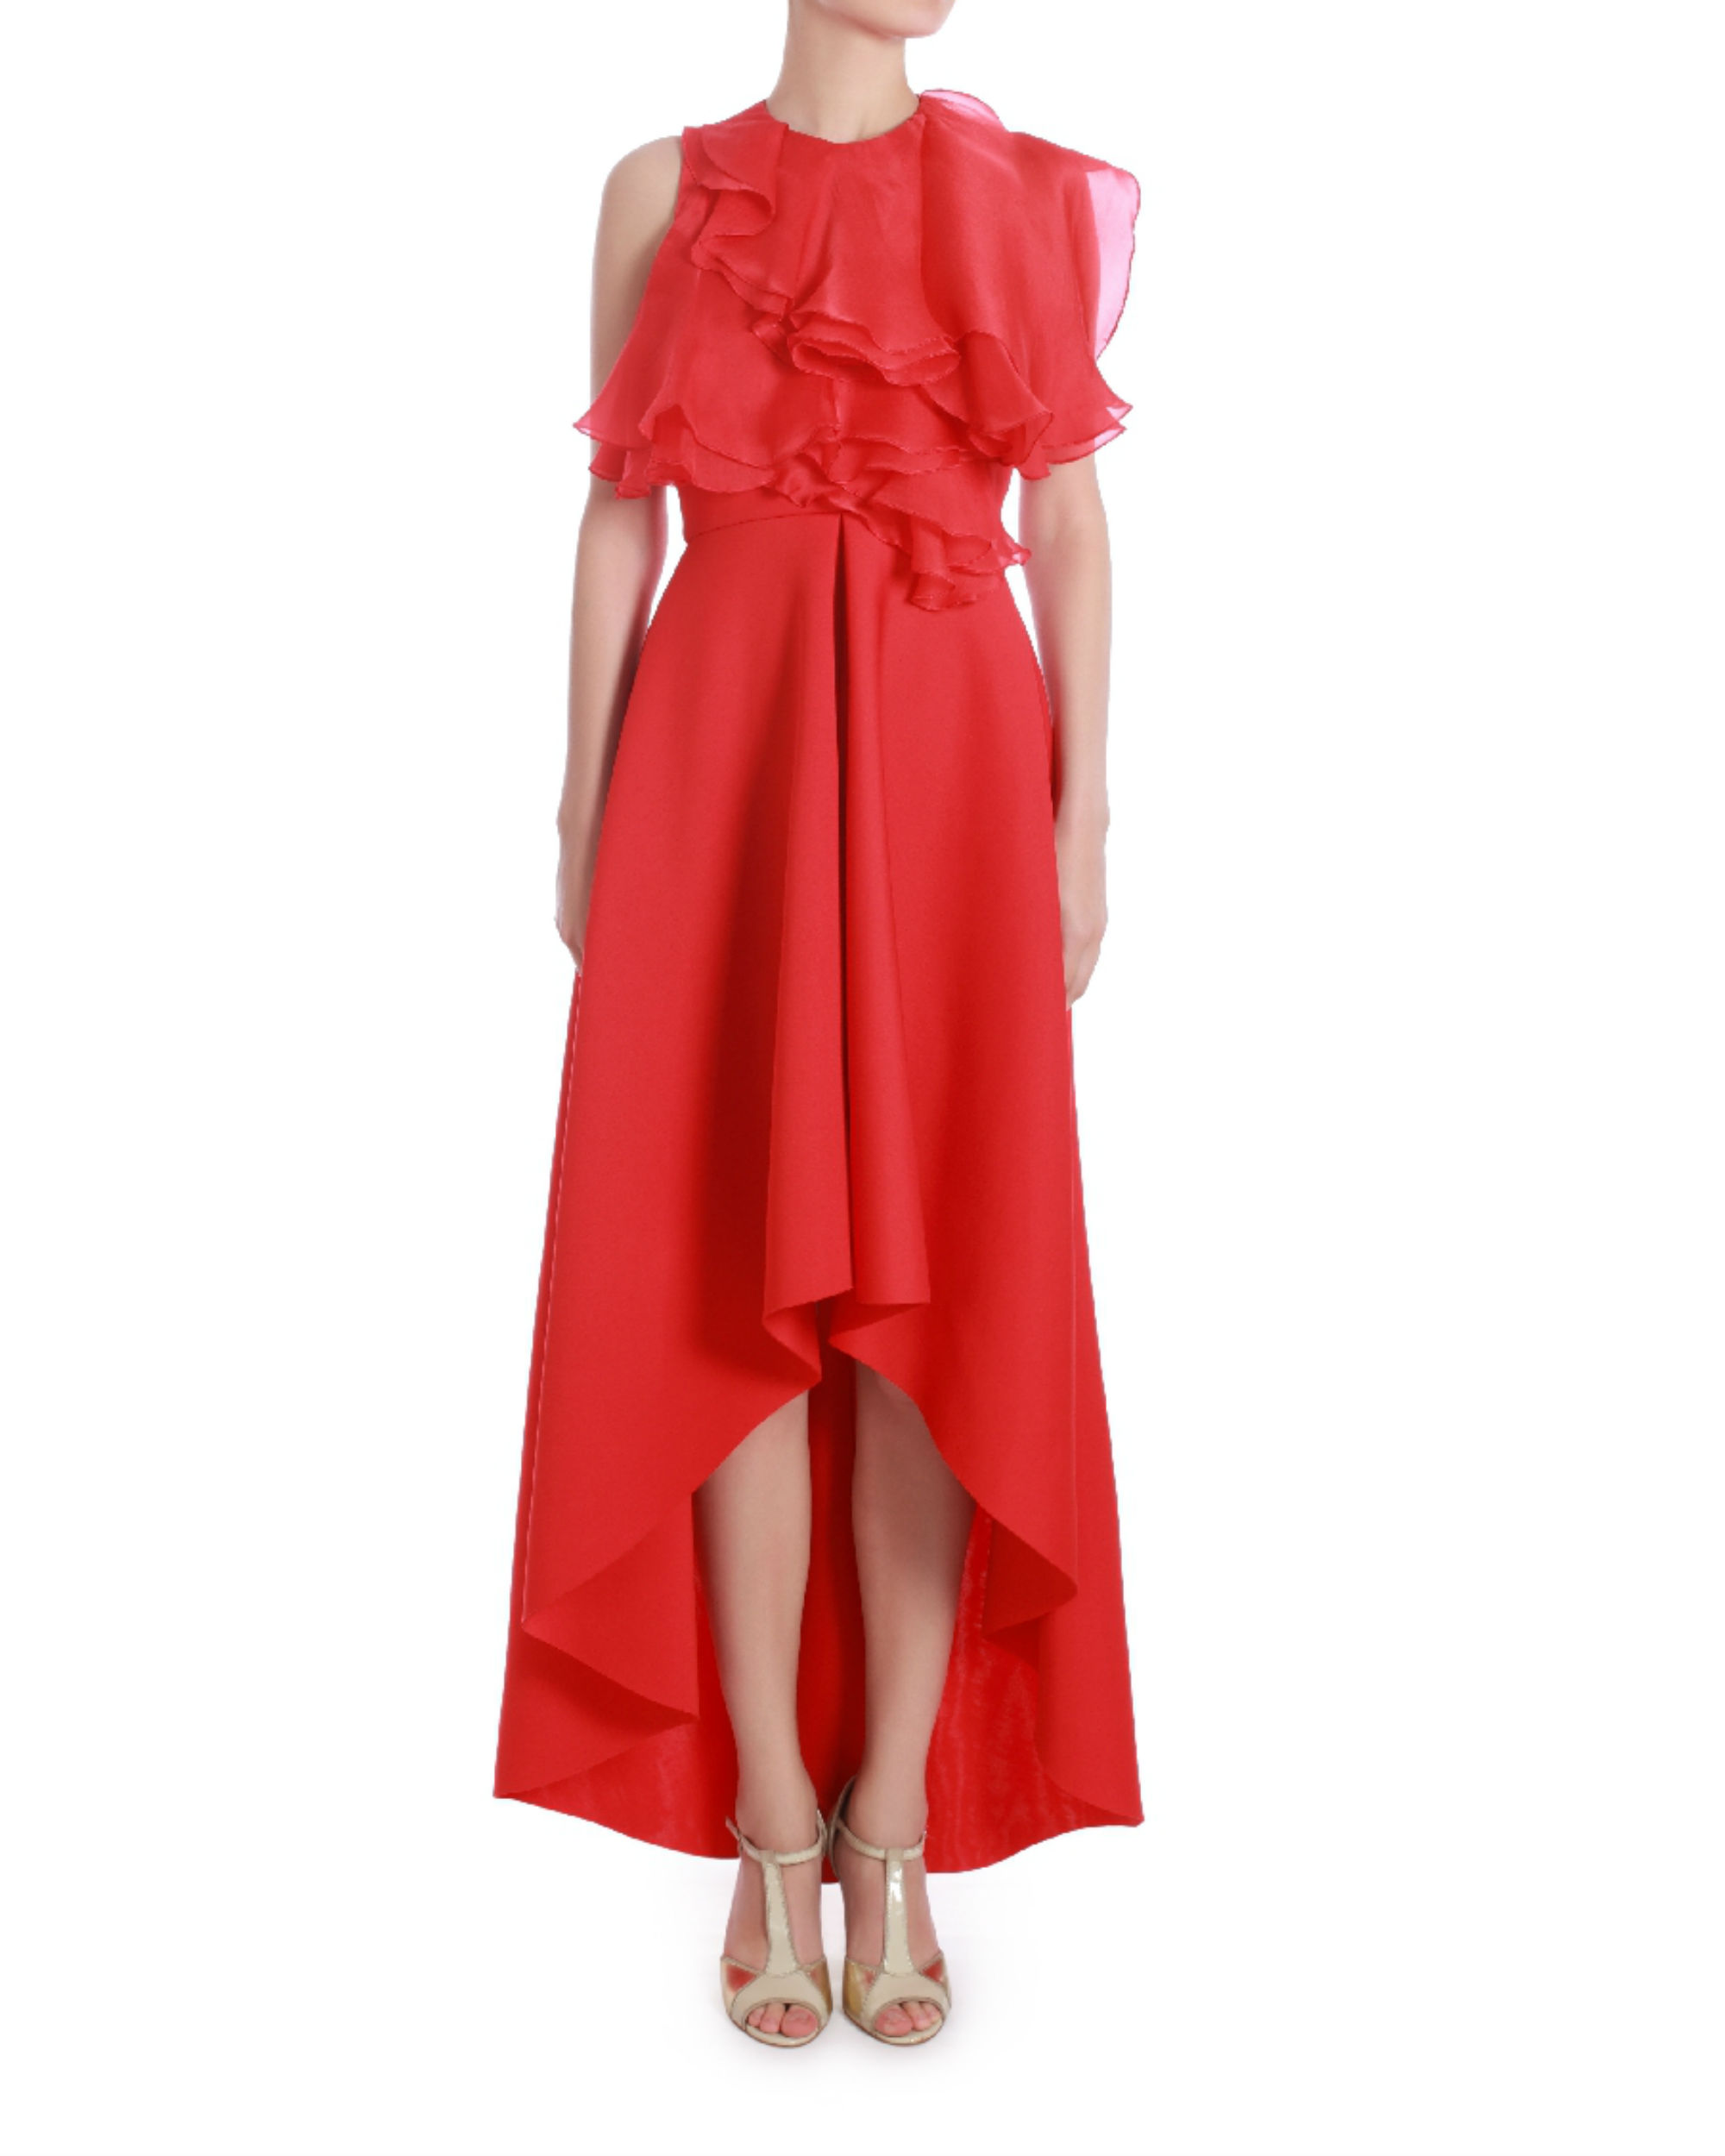 Scarlet monteiro dress